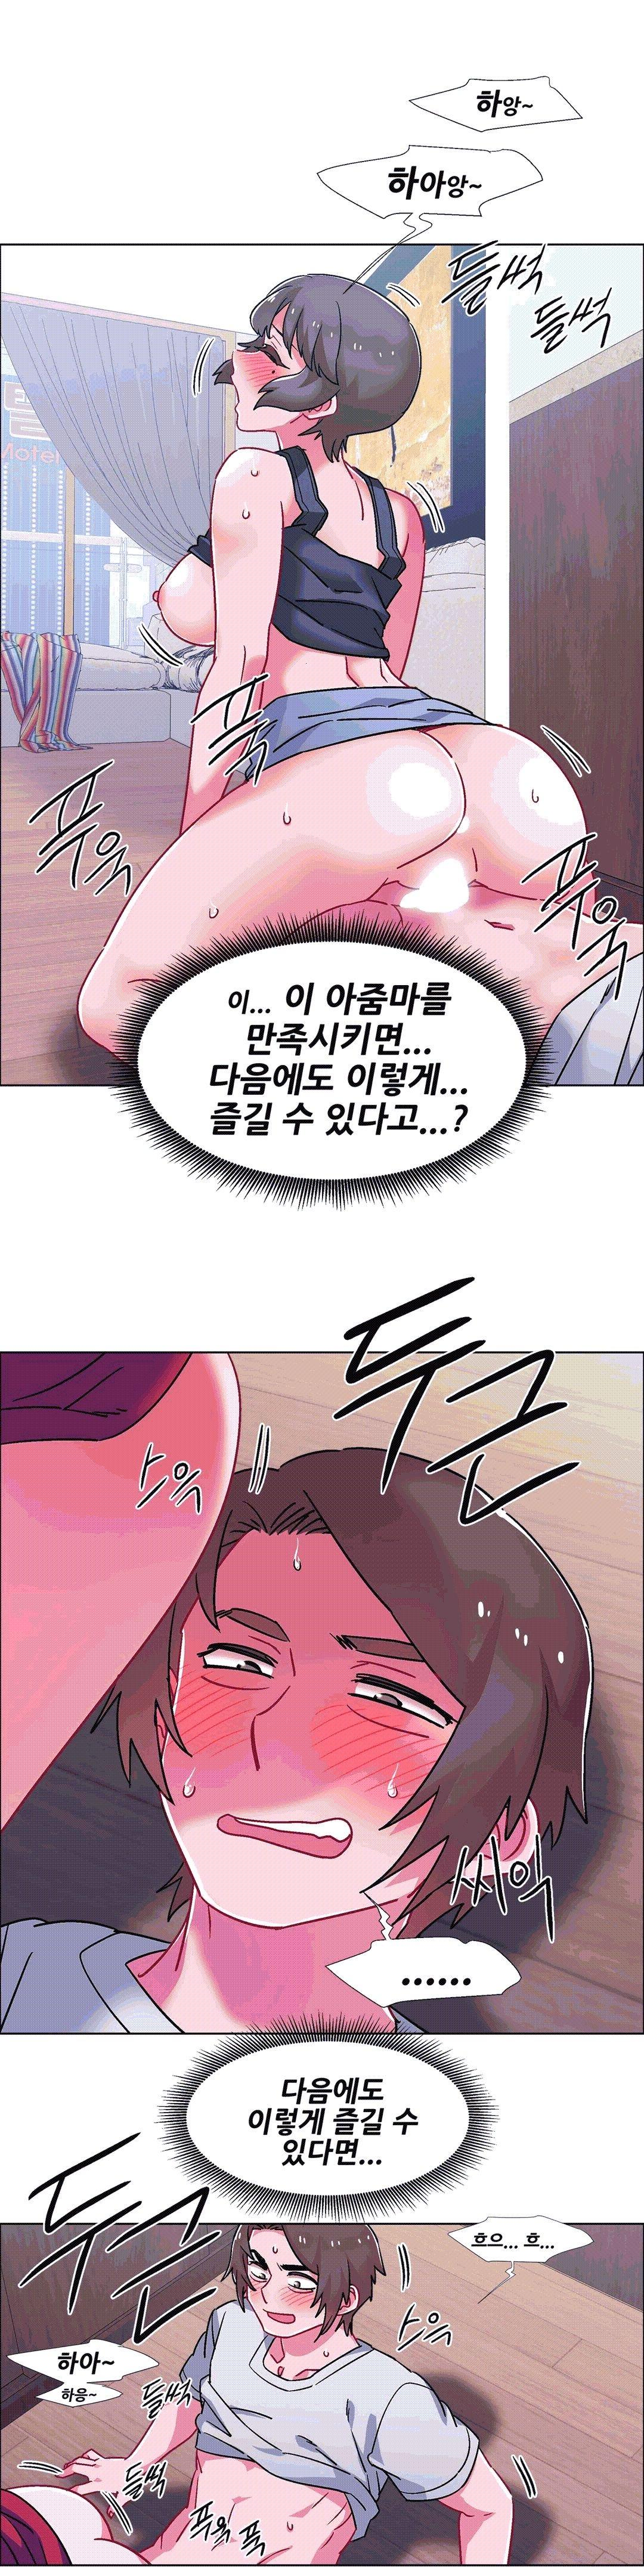 [Studio Wannabe] Rental Girls | 出租女郎 Ch. 33-58 [Chinese]  第二季 完结 626